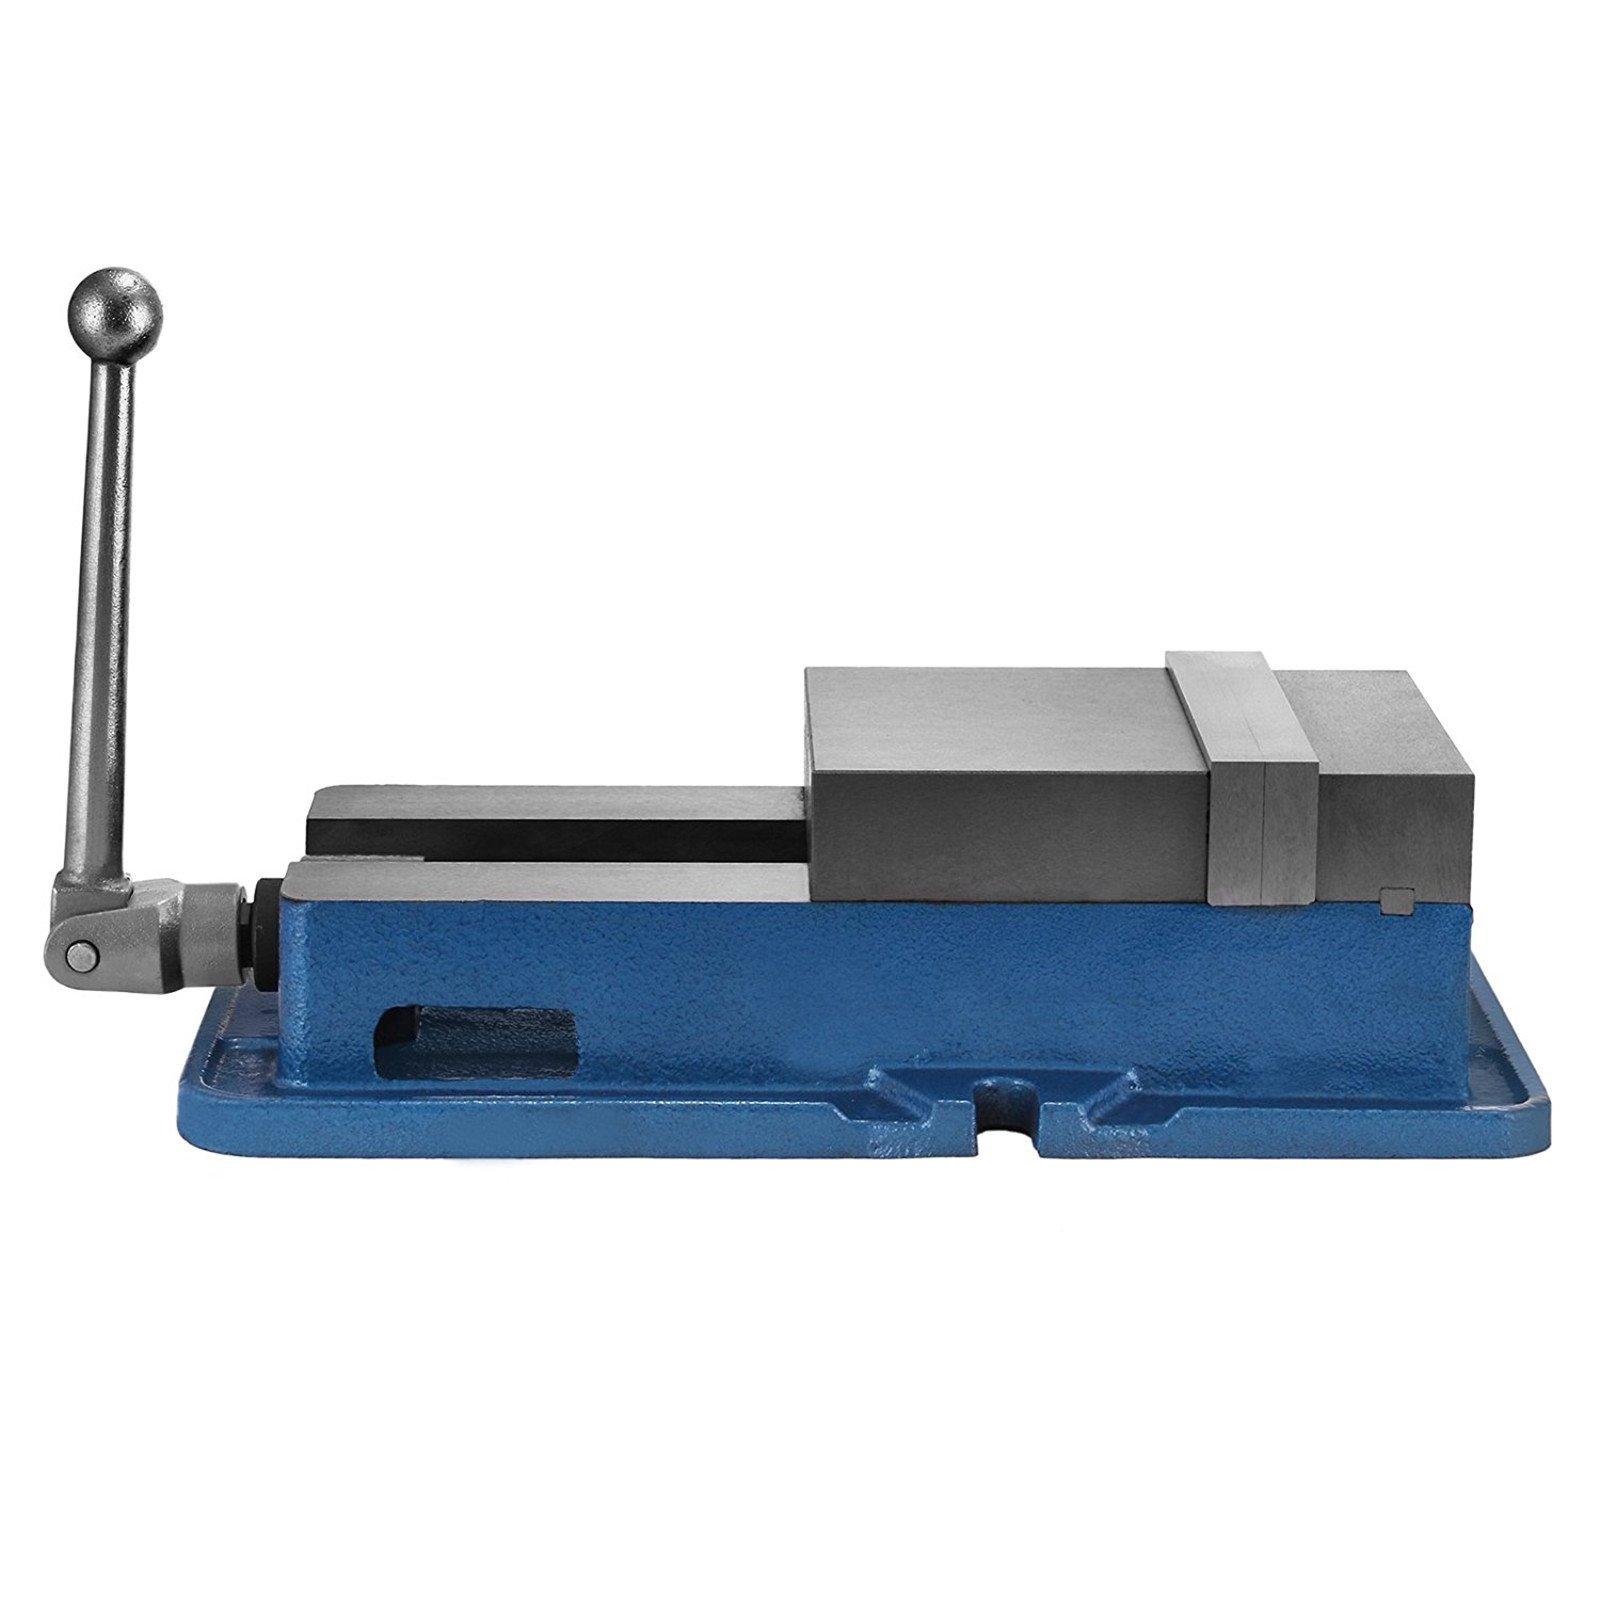 Zbond 6 Inch Precision Milling Machine lock Down Vise Accu Lock Vise Clamp Clamping Vise